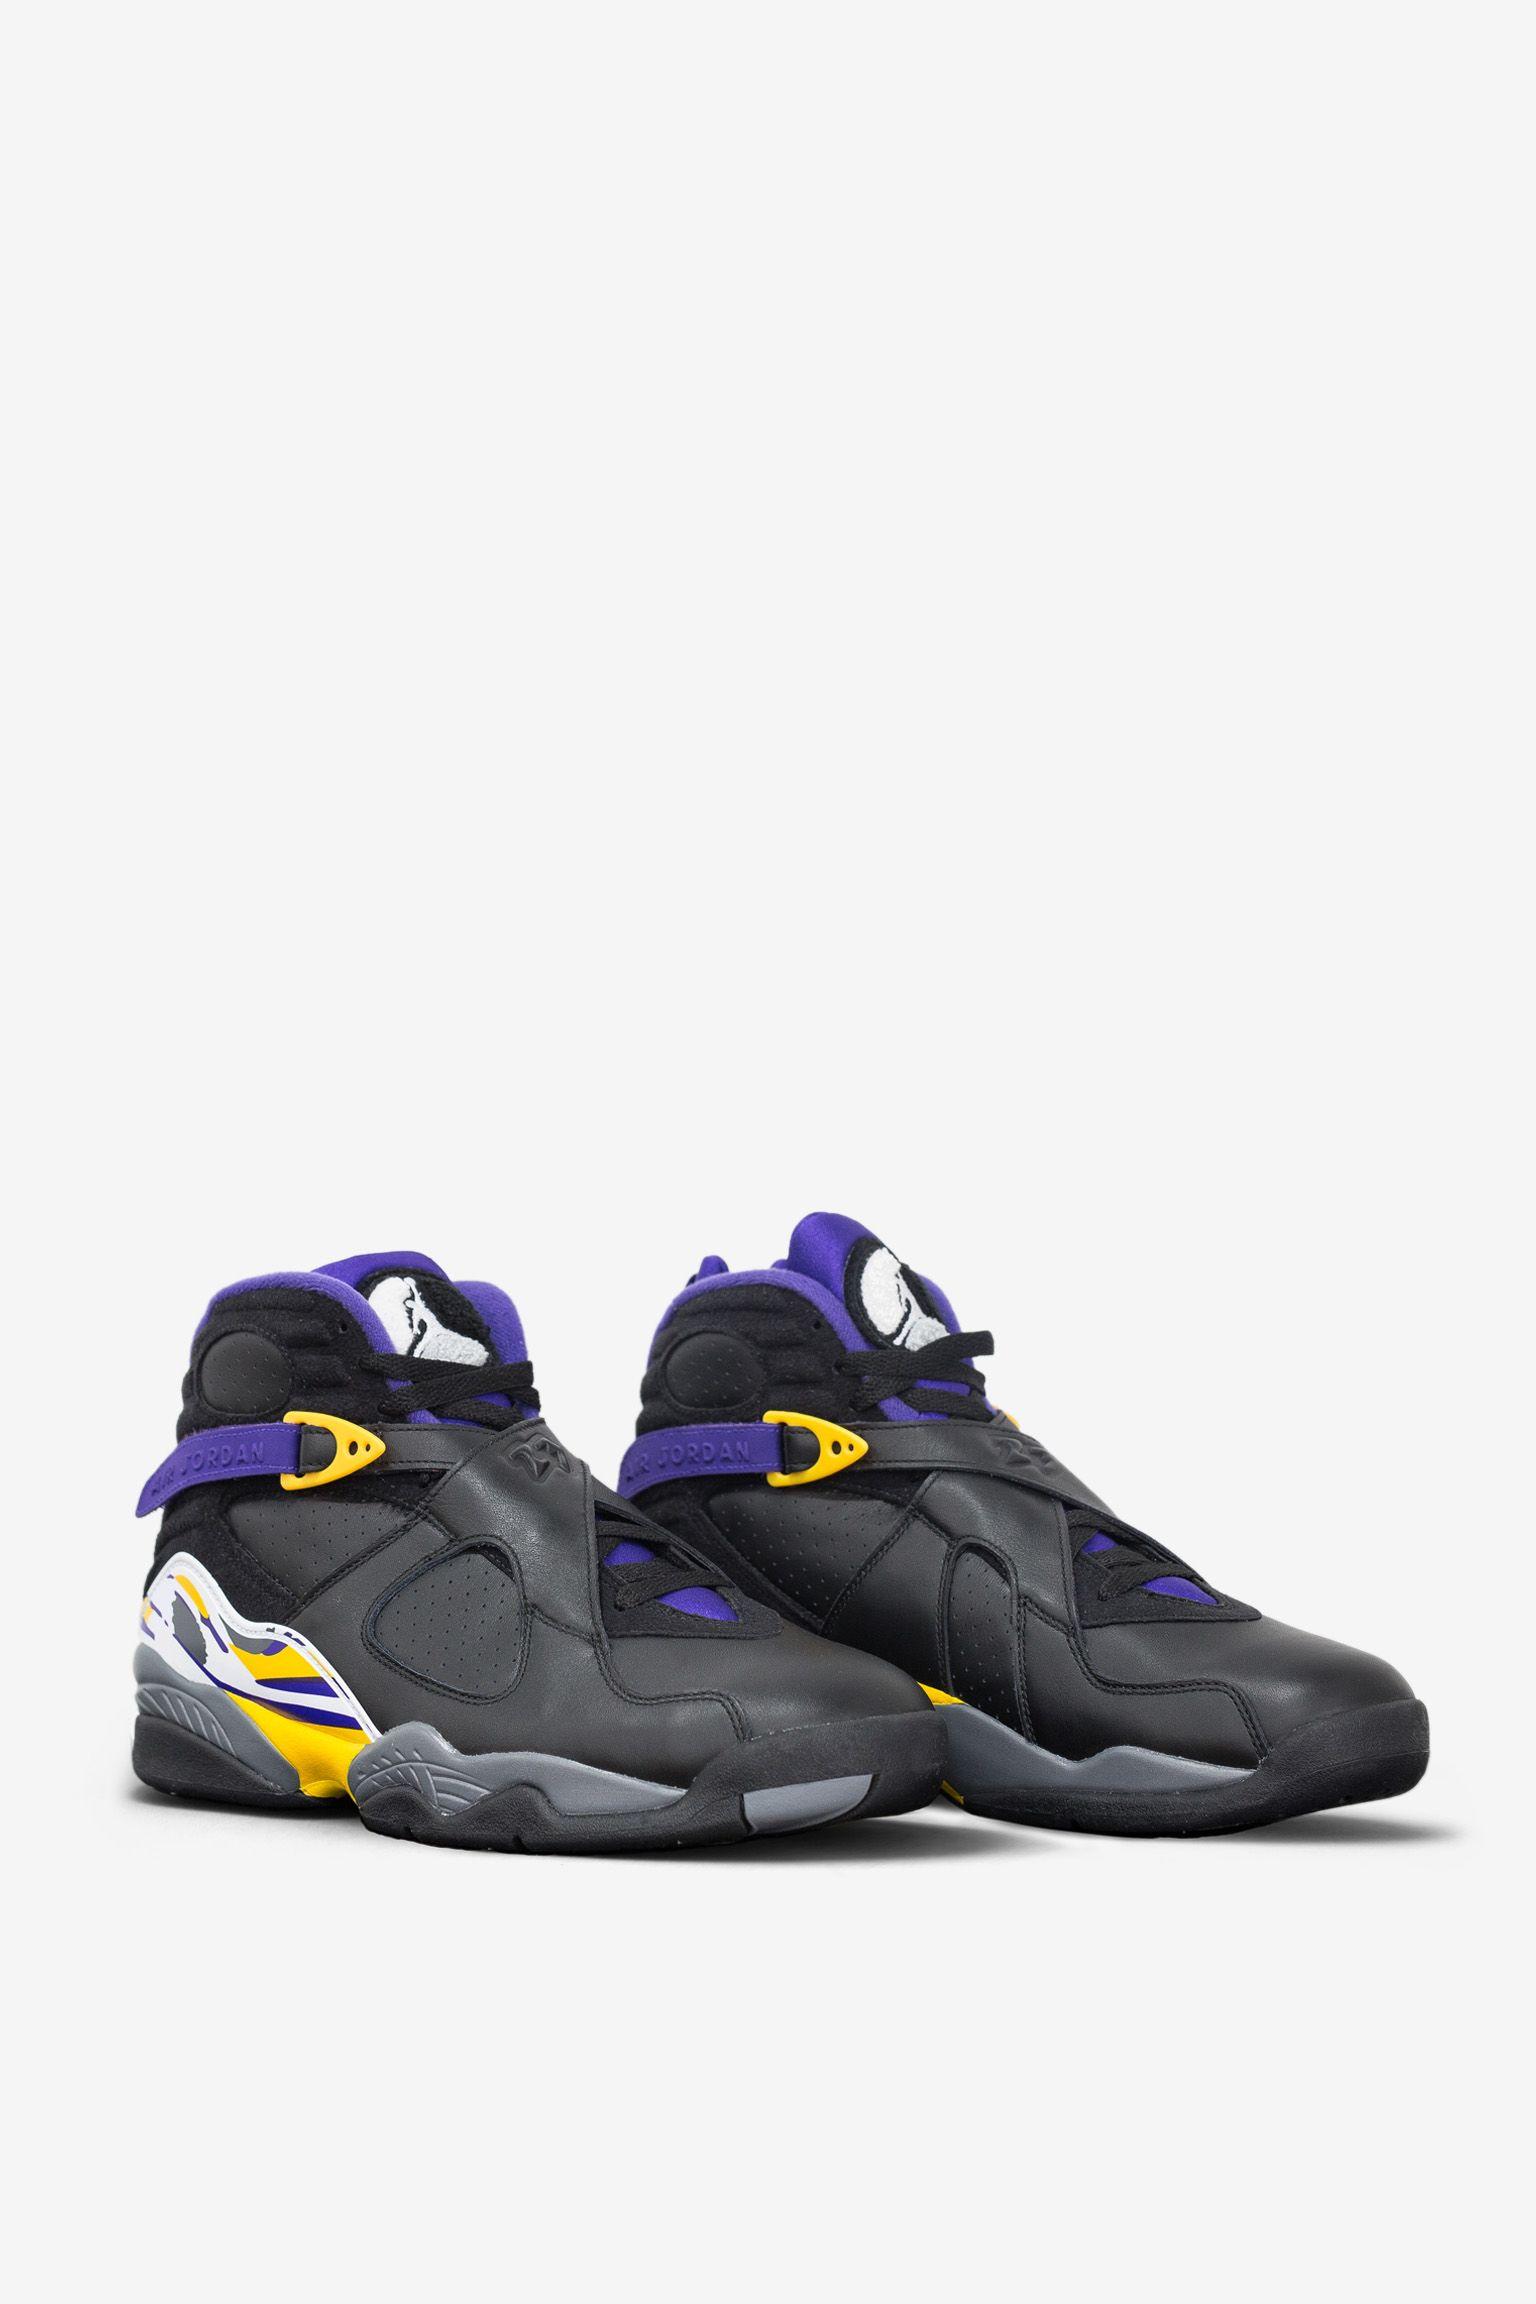 Jordan Brand Kobe Bryant Tribute. Nike SNKRS SI